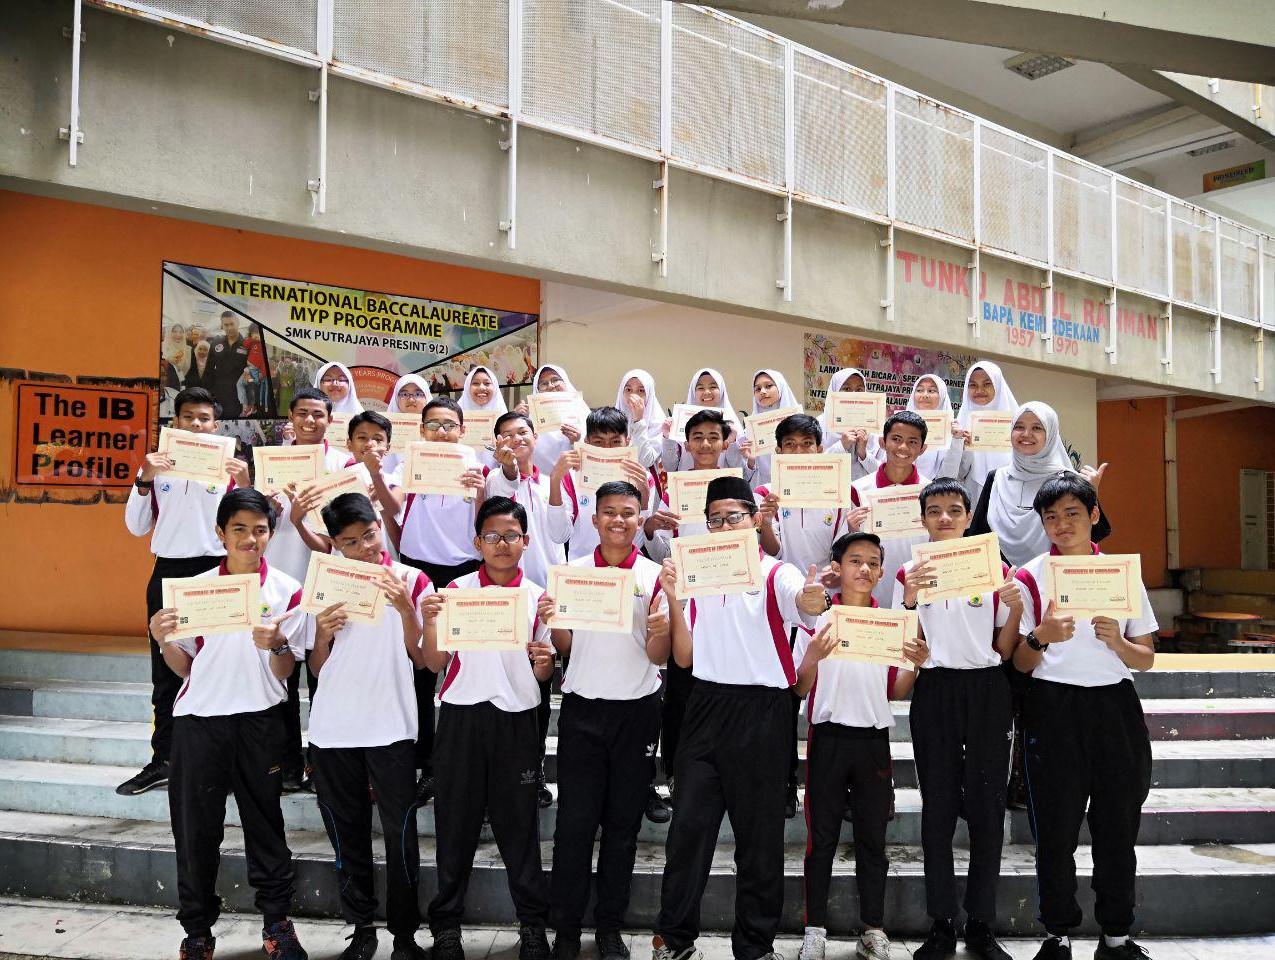 SMK Putrajaya Presint 9(2) (3)